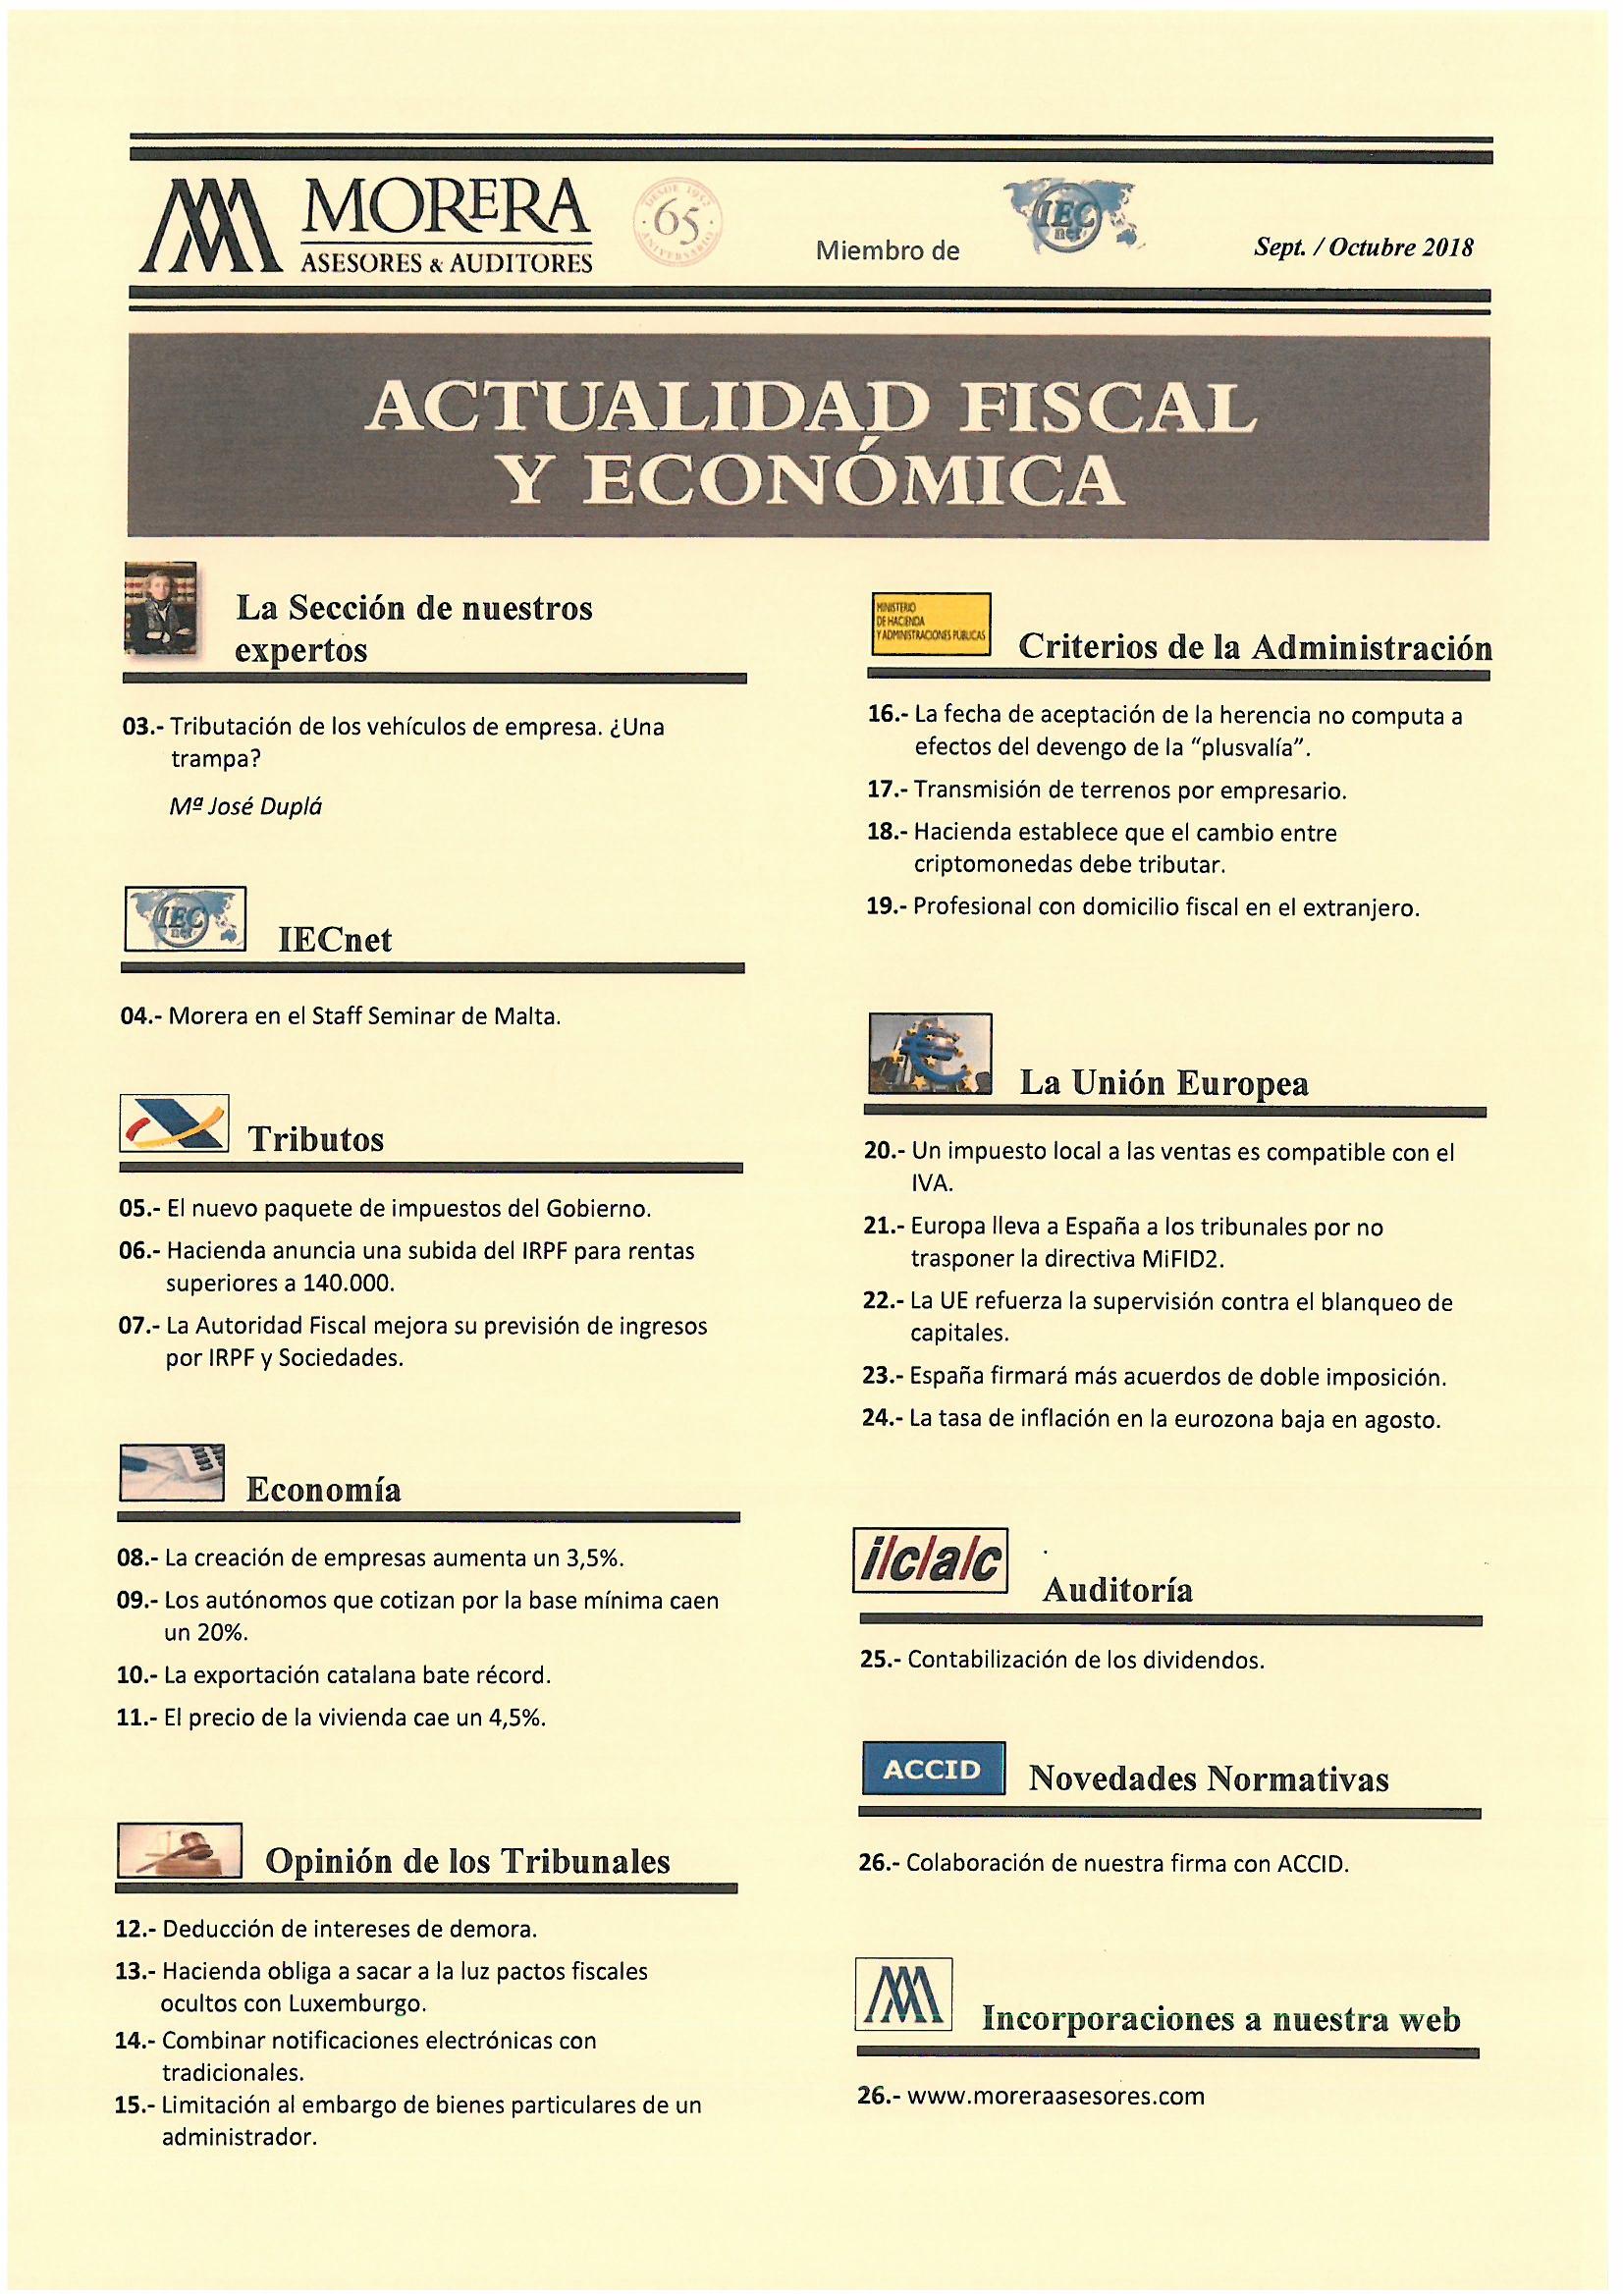 Revista Sep/Oct -18 Morera Asesores & Auditores